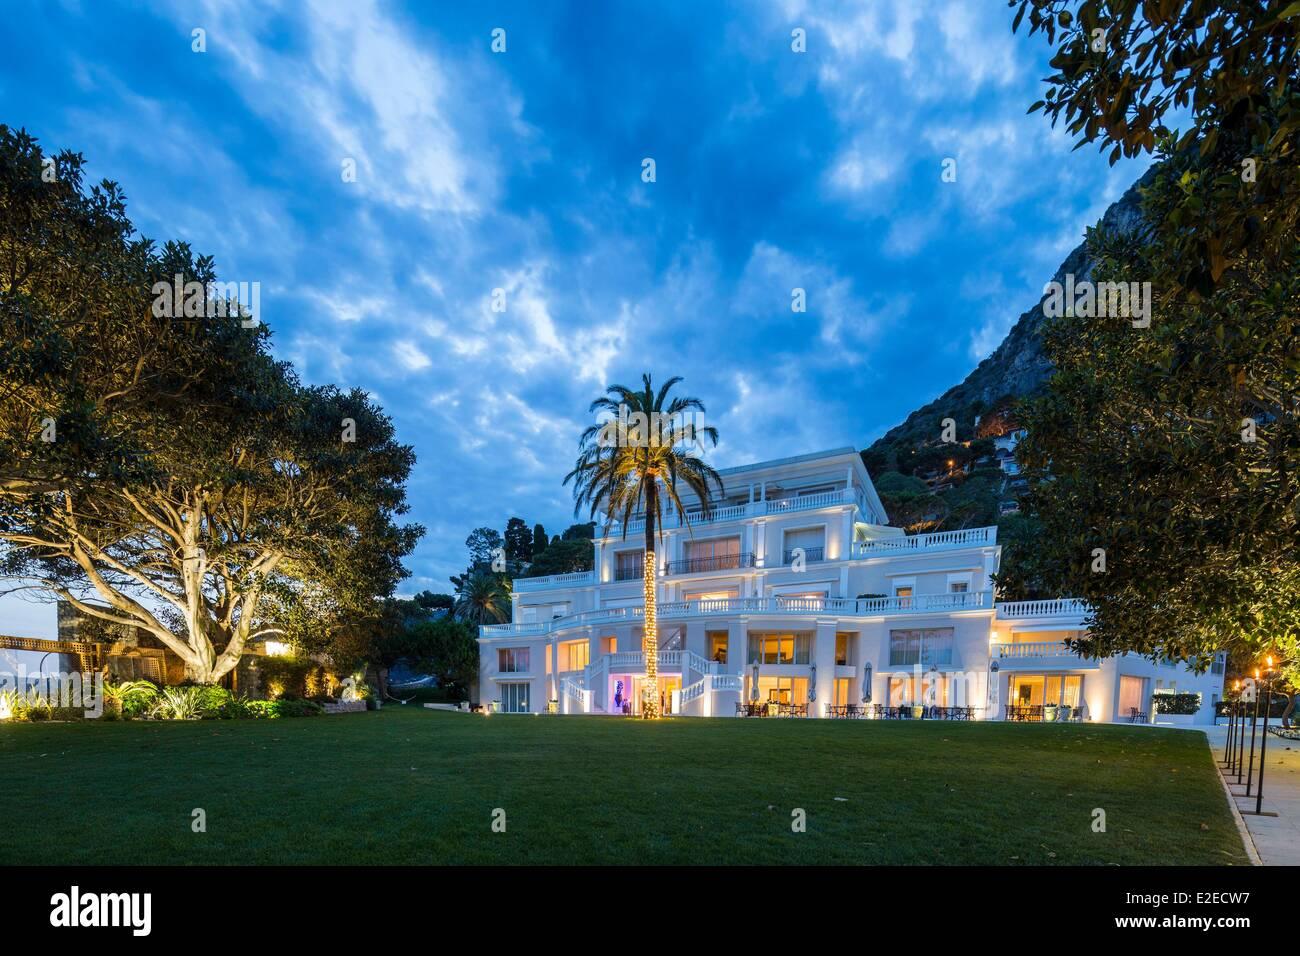 France, Alpes Maritimes, Eze Bord de Mer, 5 star Hotel The Cap Estel - Stock Image